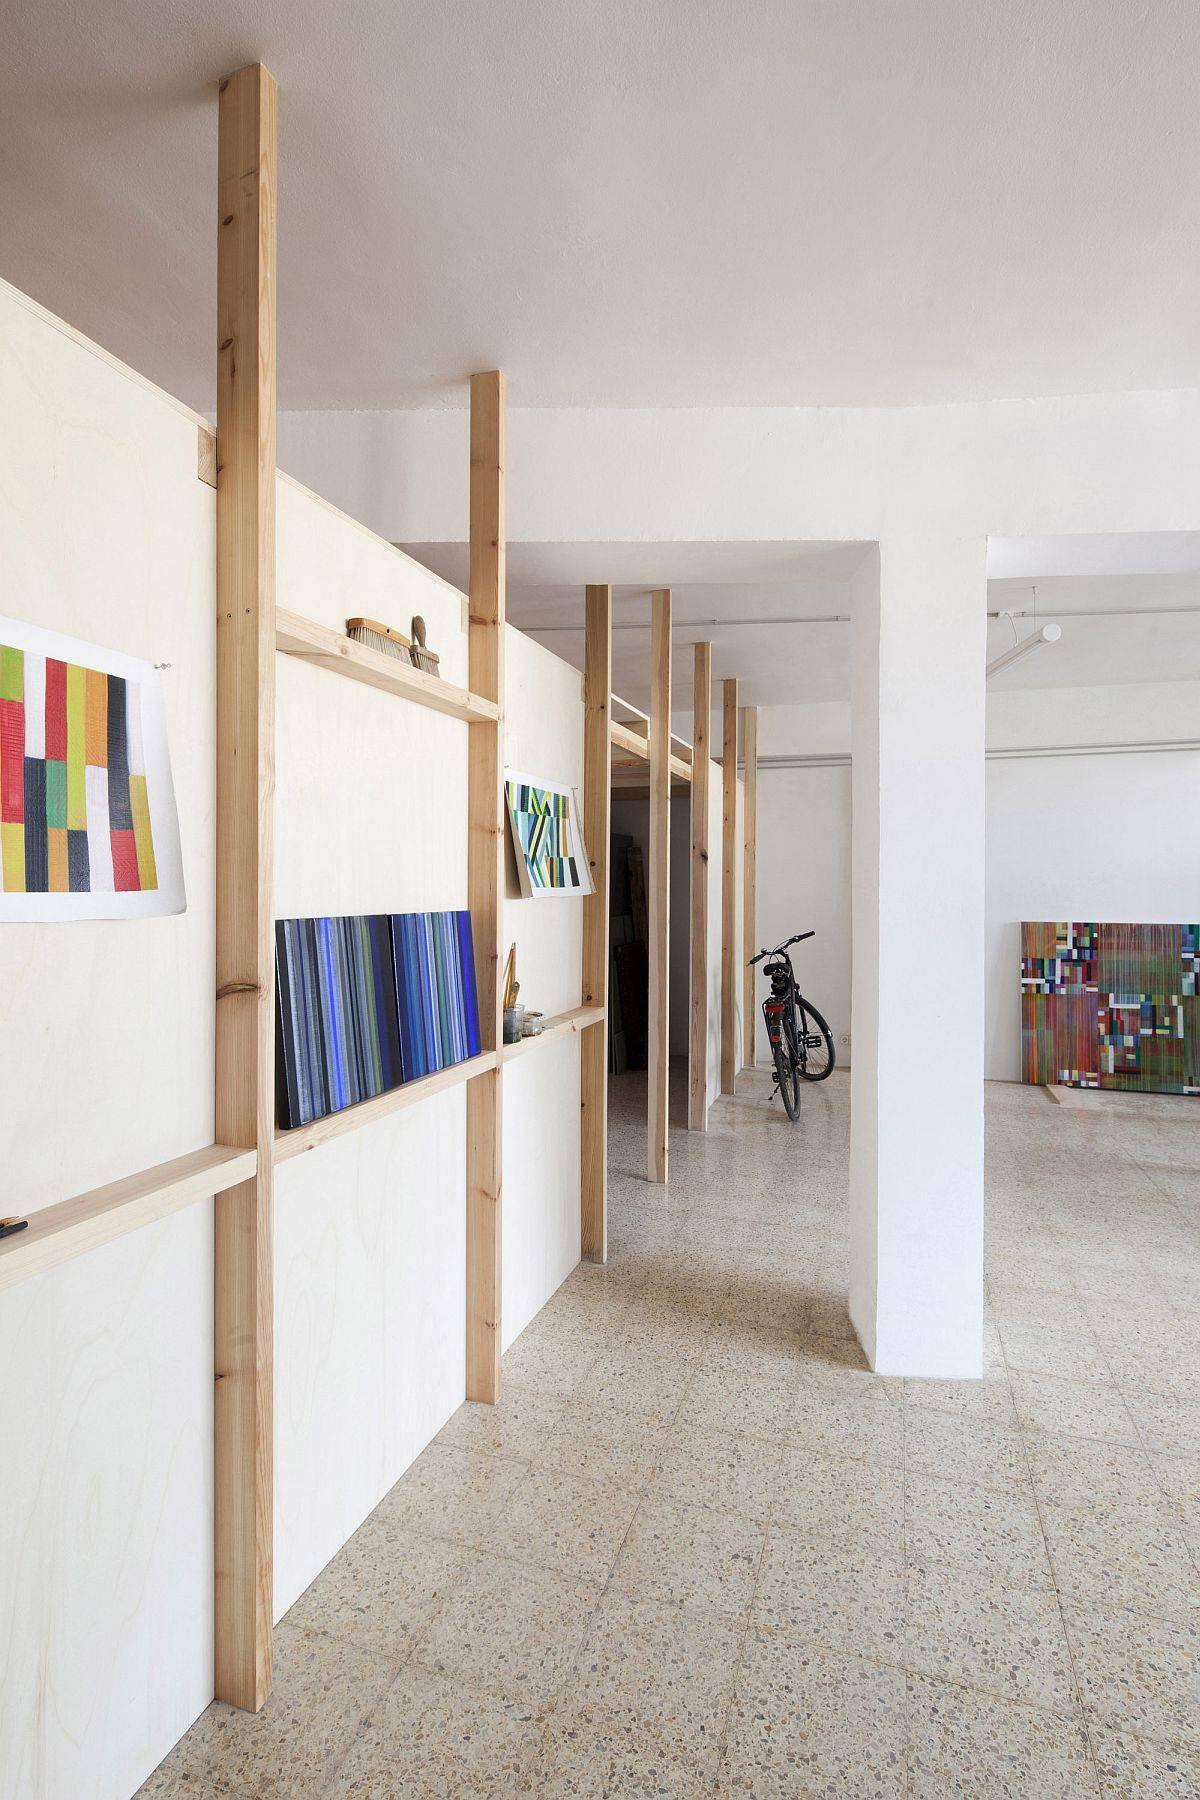 Look-inside-the-transformed-studio-of-an-artist-in-barcelona-80414